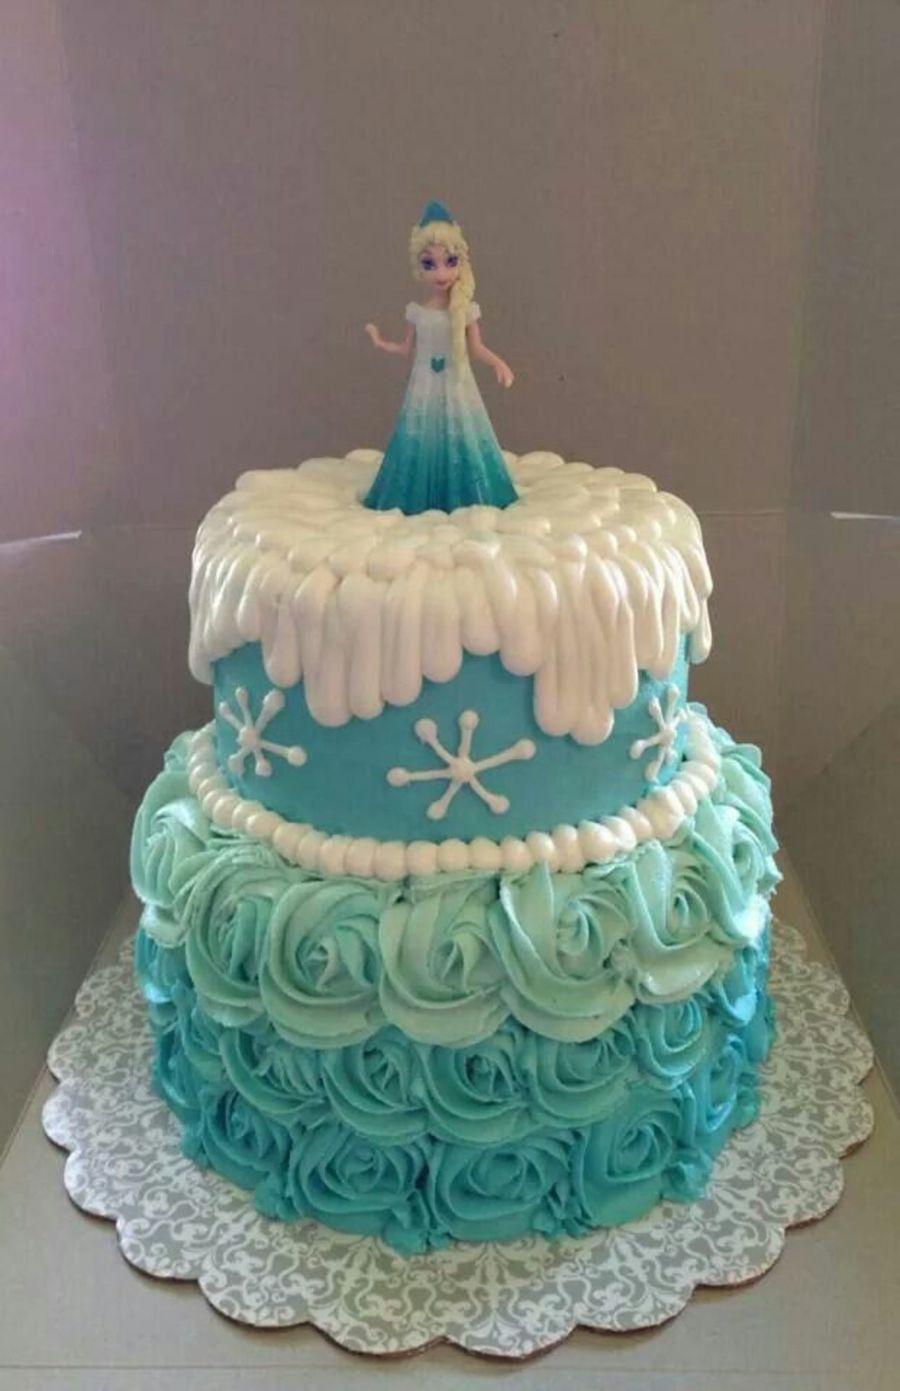 Frozen Cake1 on Cake Central Cake decorating Pinterest Cake